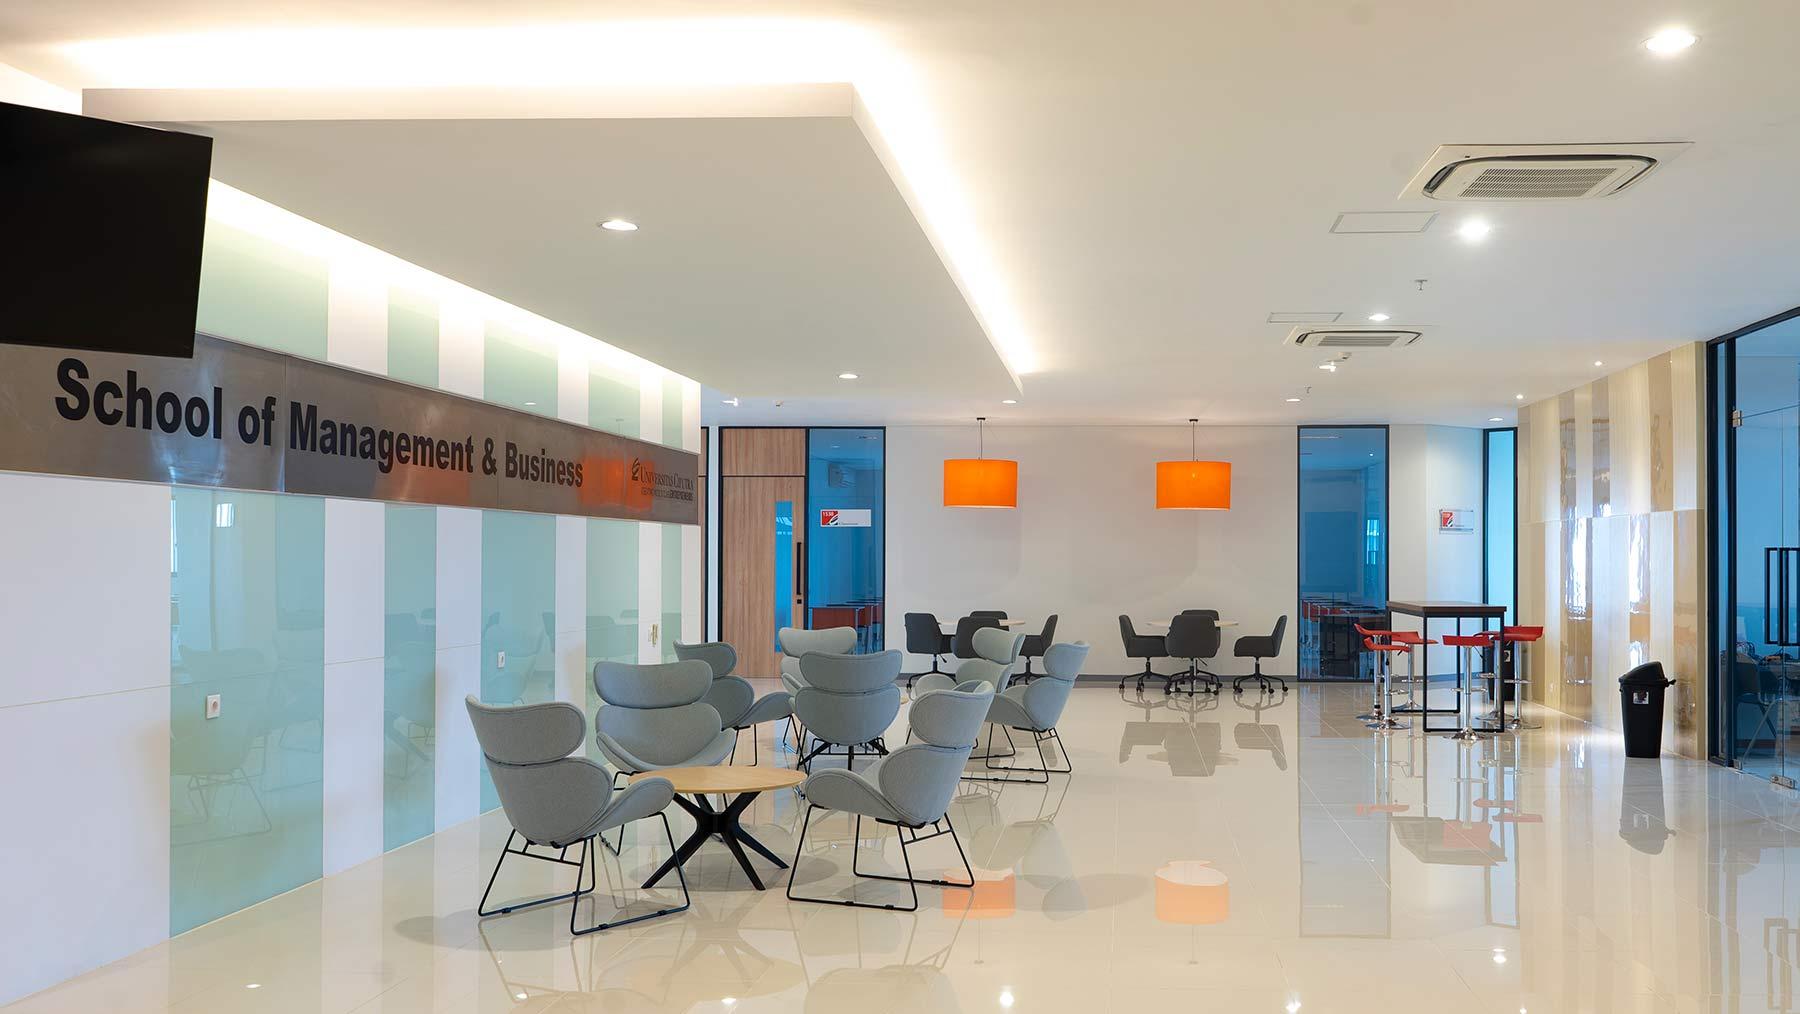 School of Management & Business Facilities